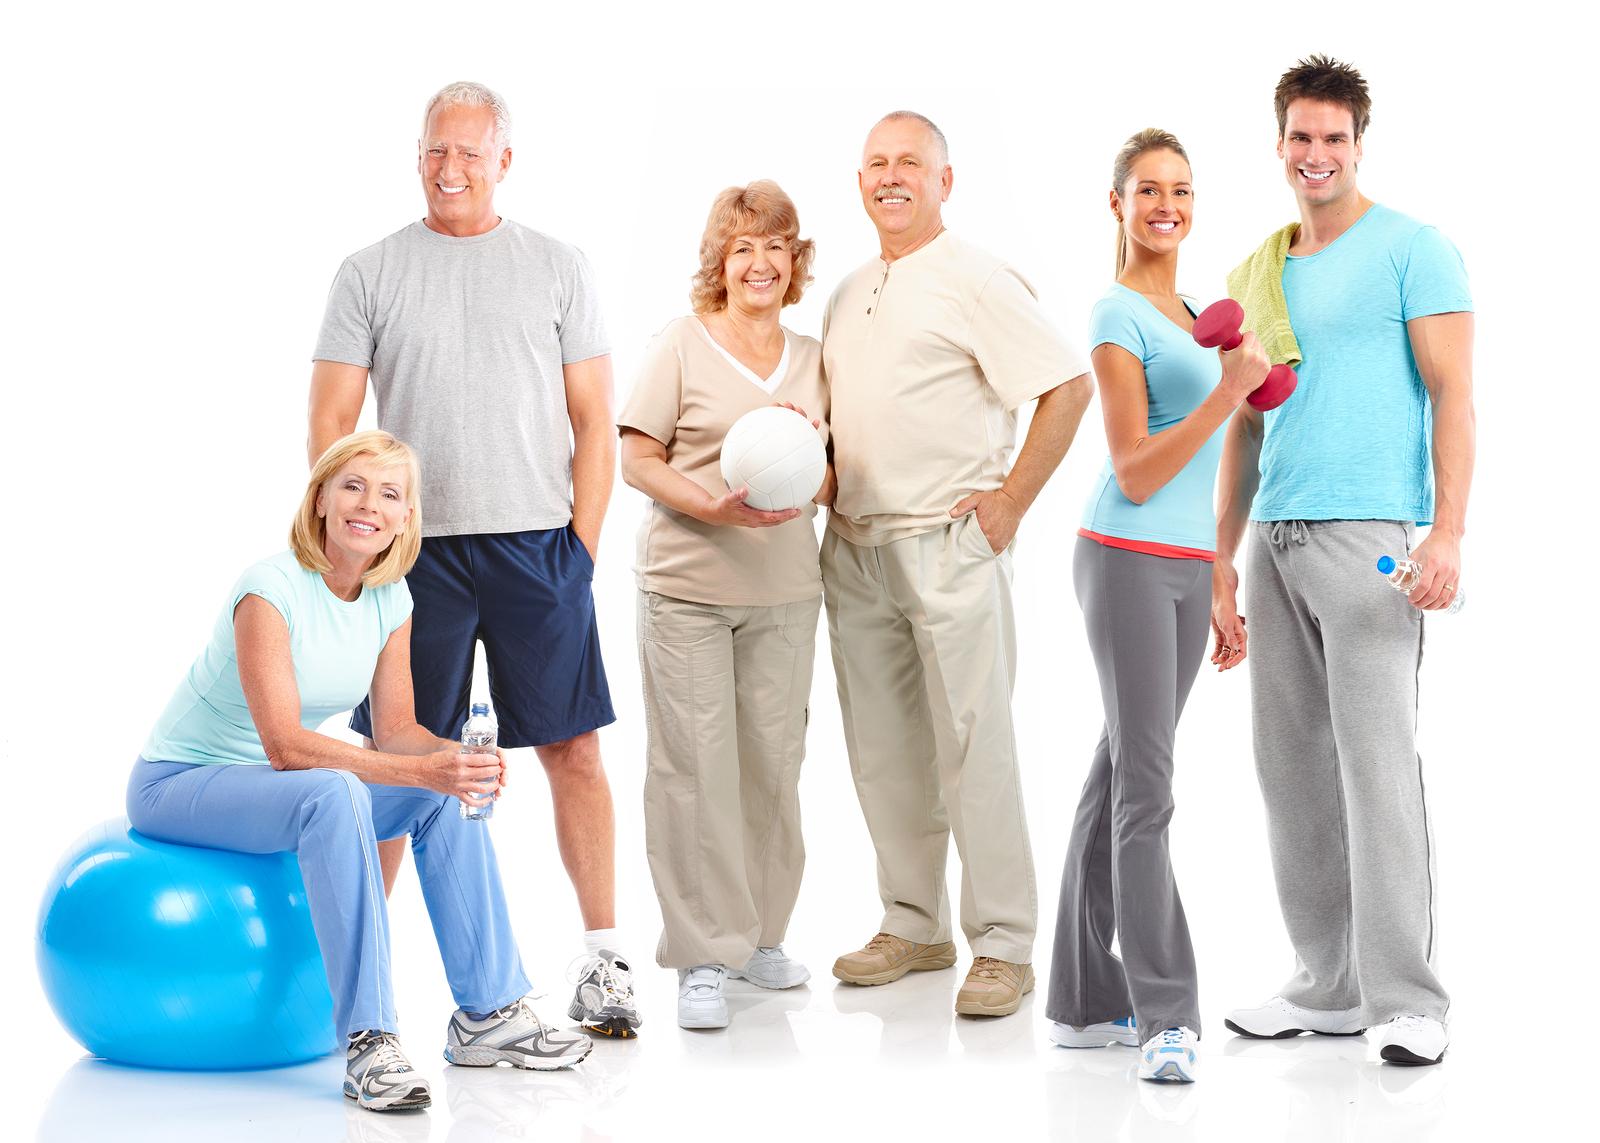 bigstock-Gym-Fitness-Healthy-Lifestyl-9678614.jpg